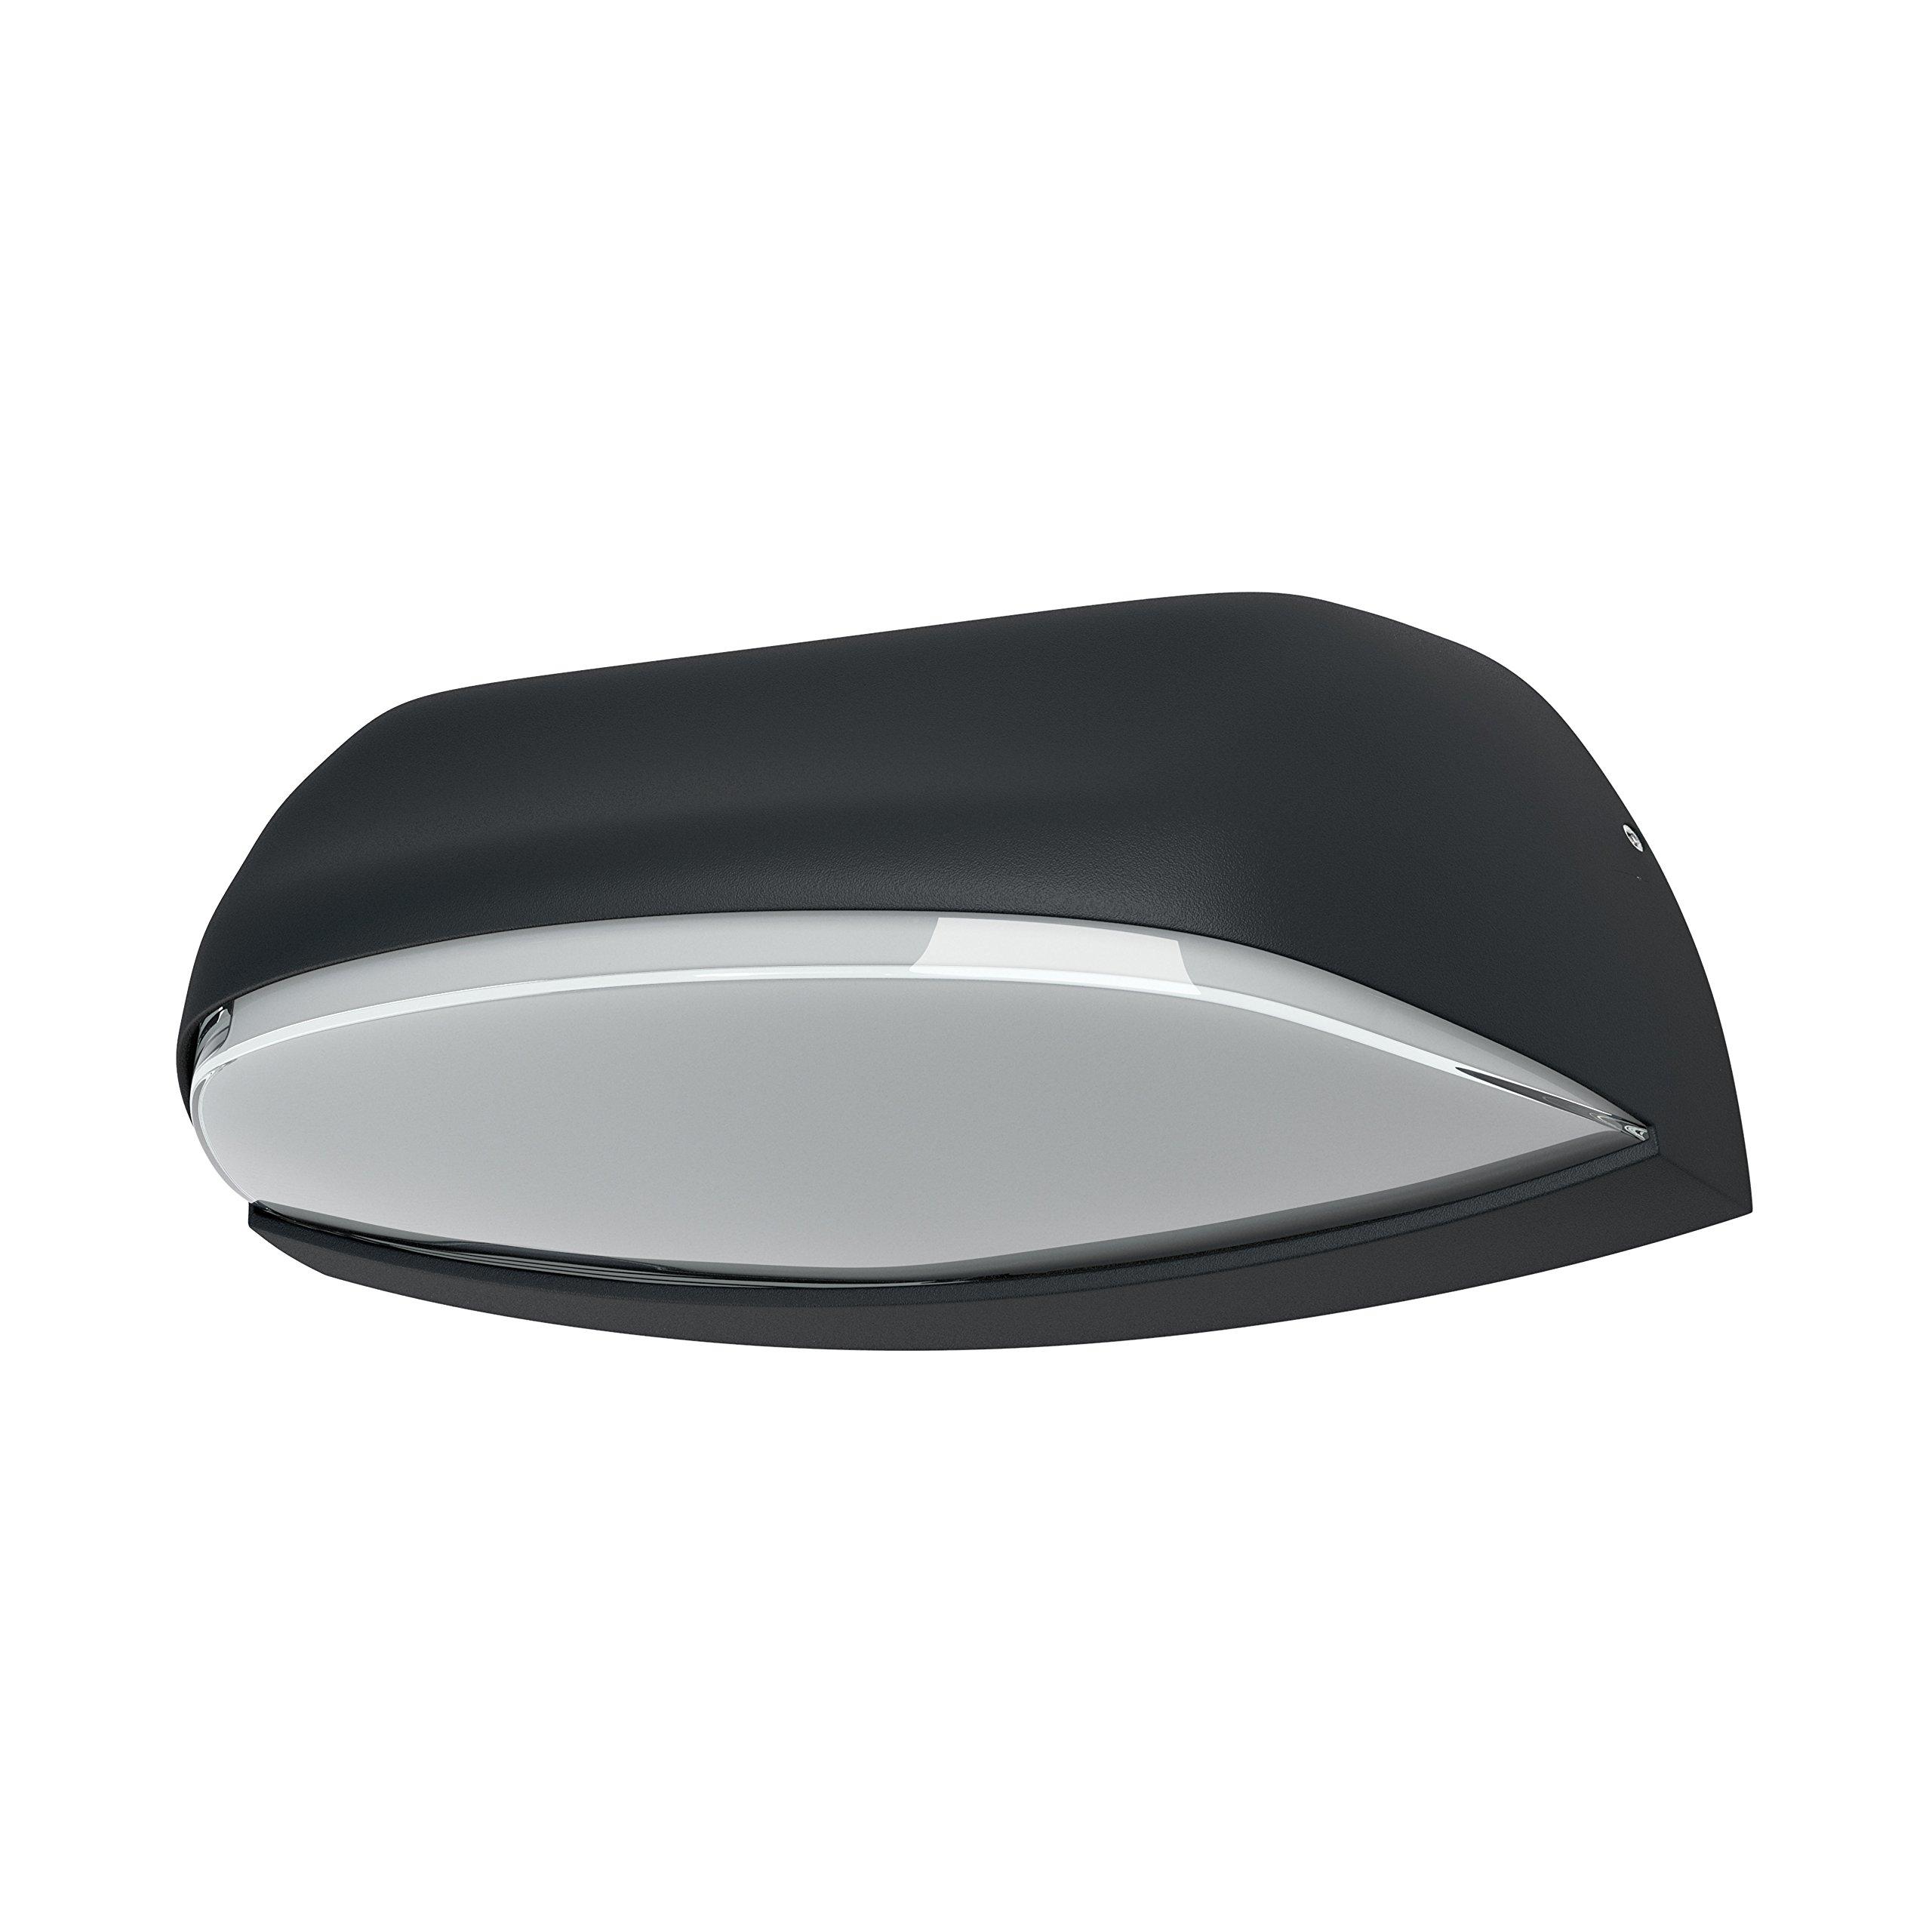 Osram Endura风格 宽LED壁灯户外 灯具,暖白色,12瓦